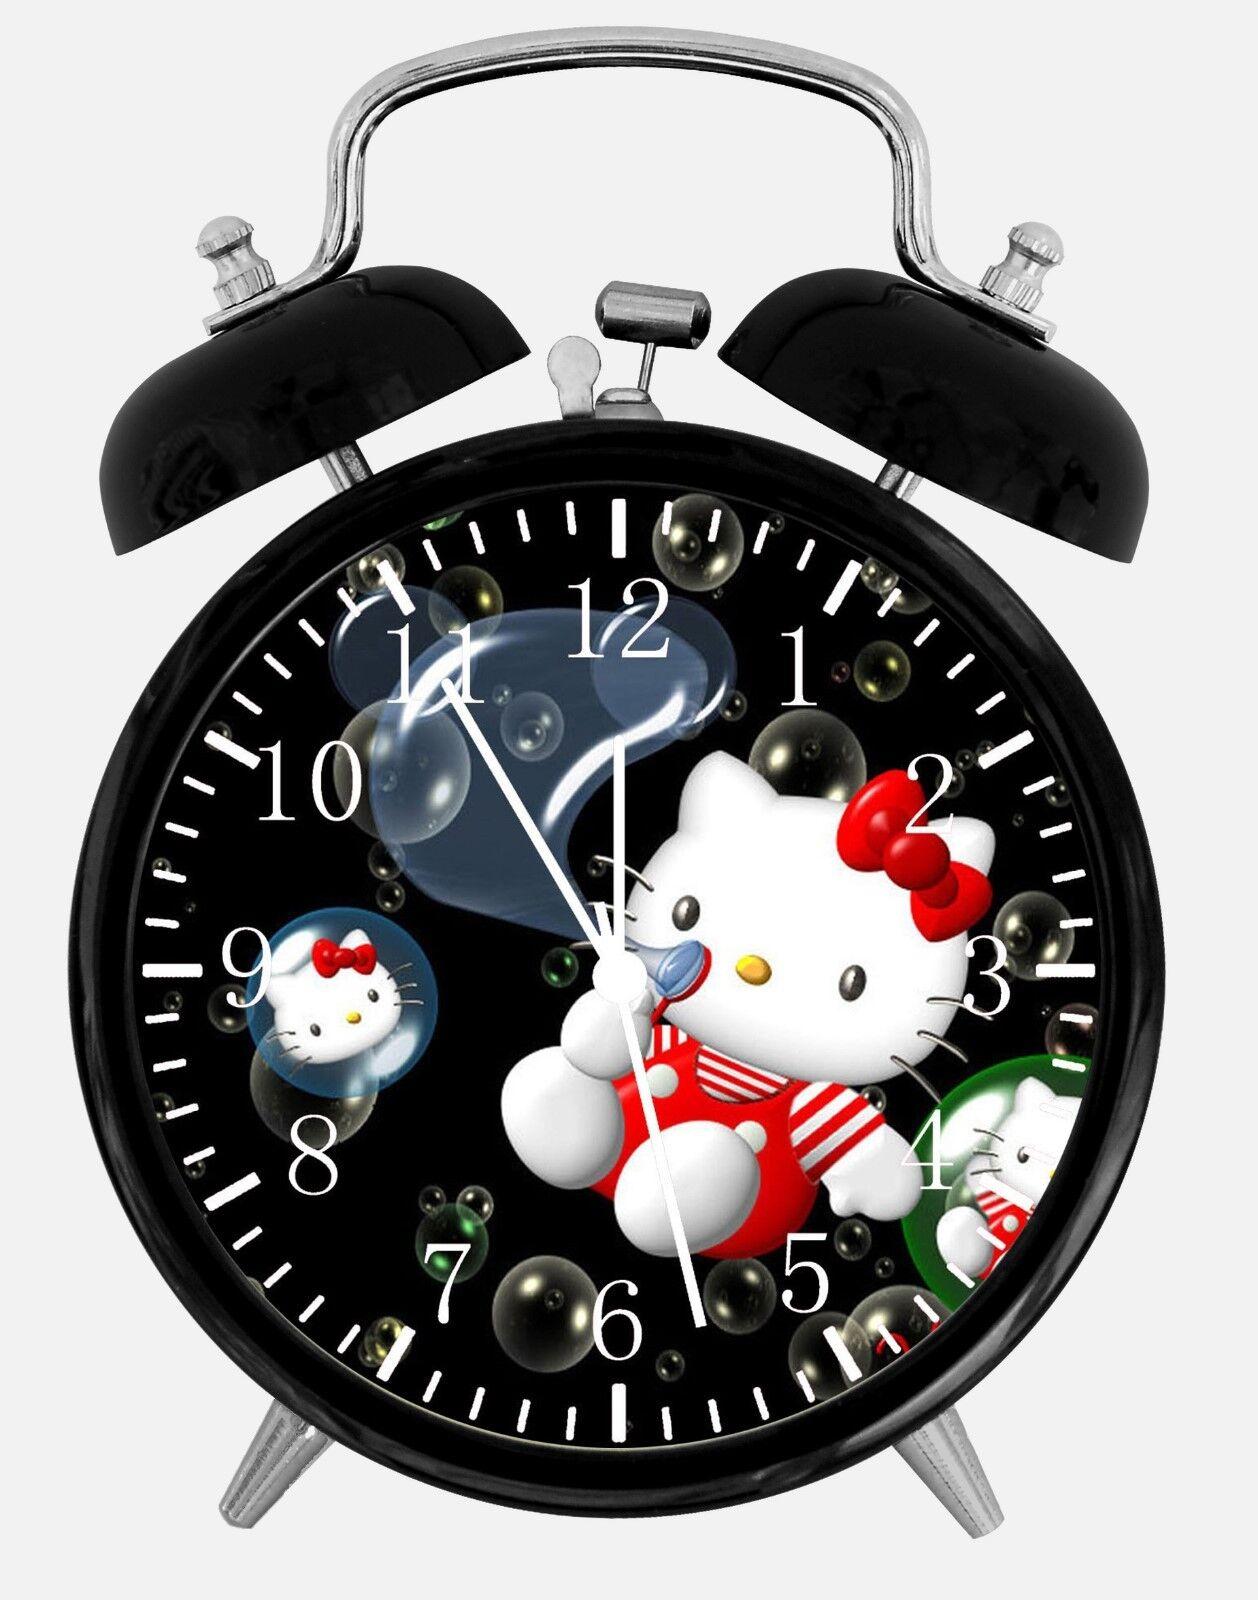 "Hello Kitty Alarm Desk Clock 3.75"" Room Office Decor W06 Will Be a Nice Gift"